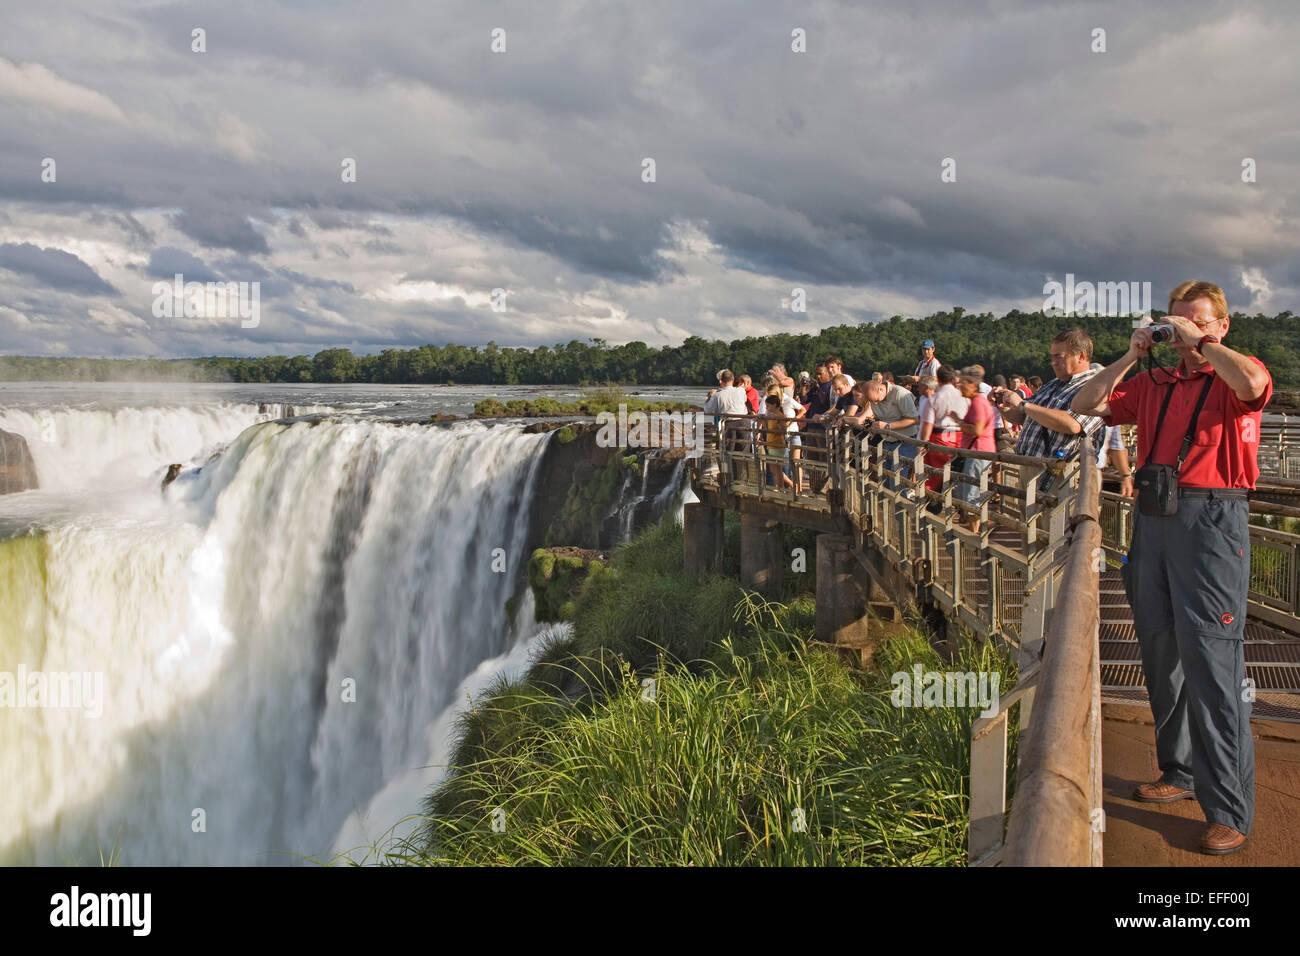 Tourists, Garganta del Diablo Devil's Throat, Iguazu National Park, Argentina - Stock Image